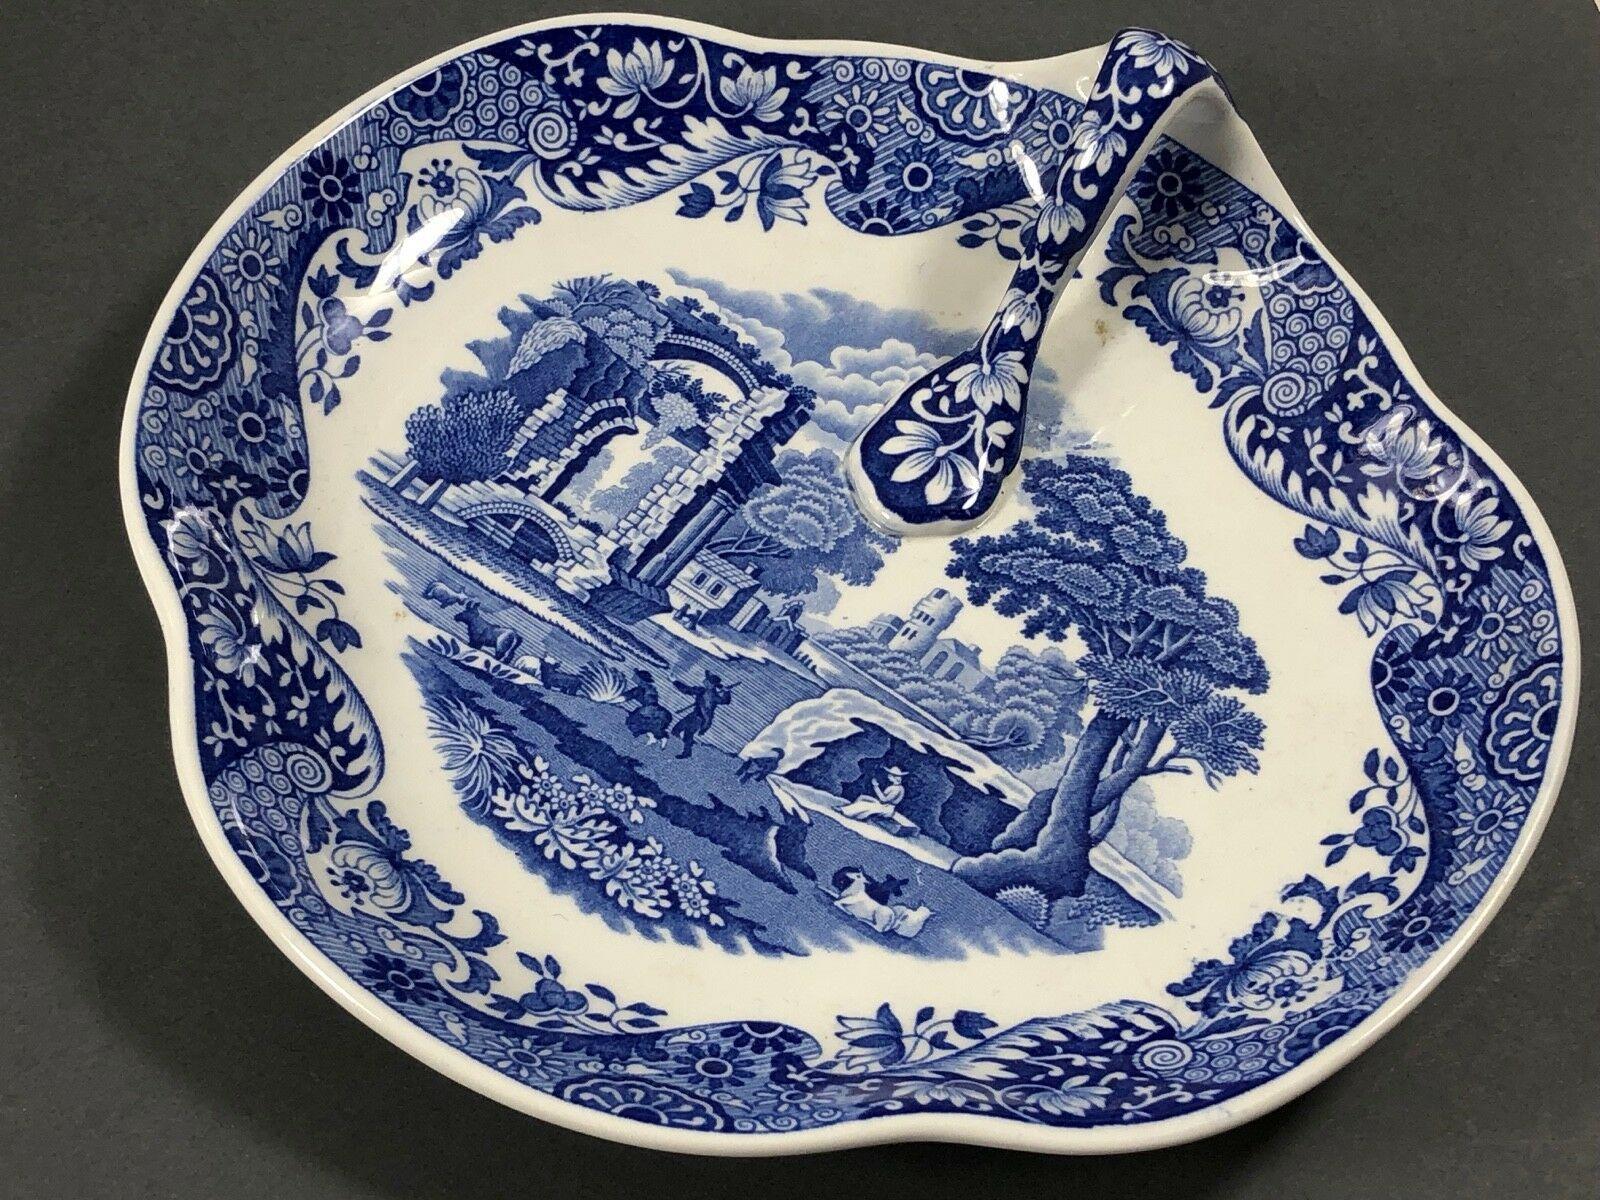 Spode England Porcelain Blue Italian Handled Tray Bowl Serving Plate C.1816   eBay   Serving ...